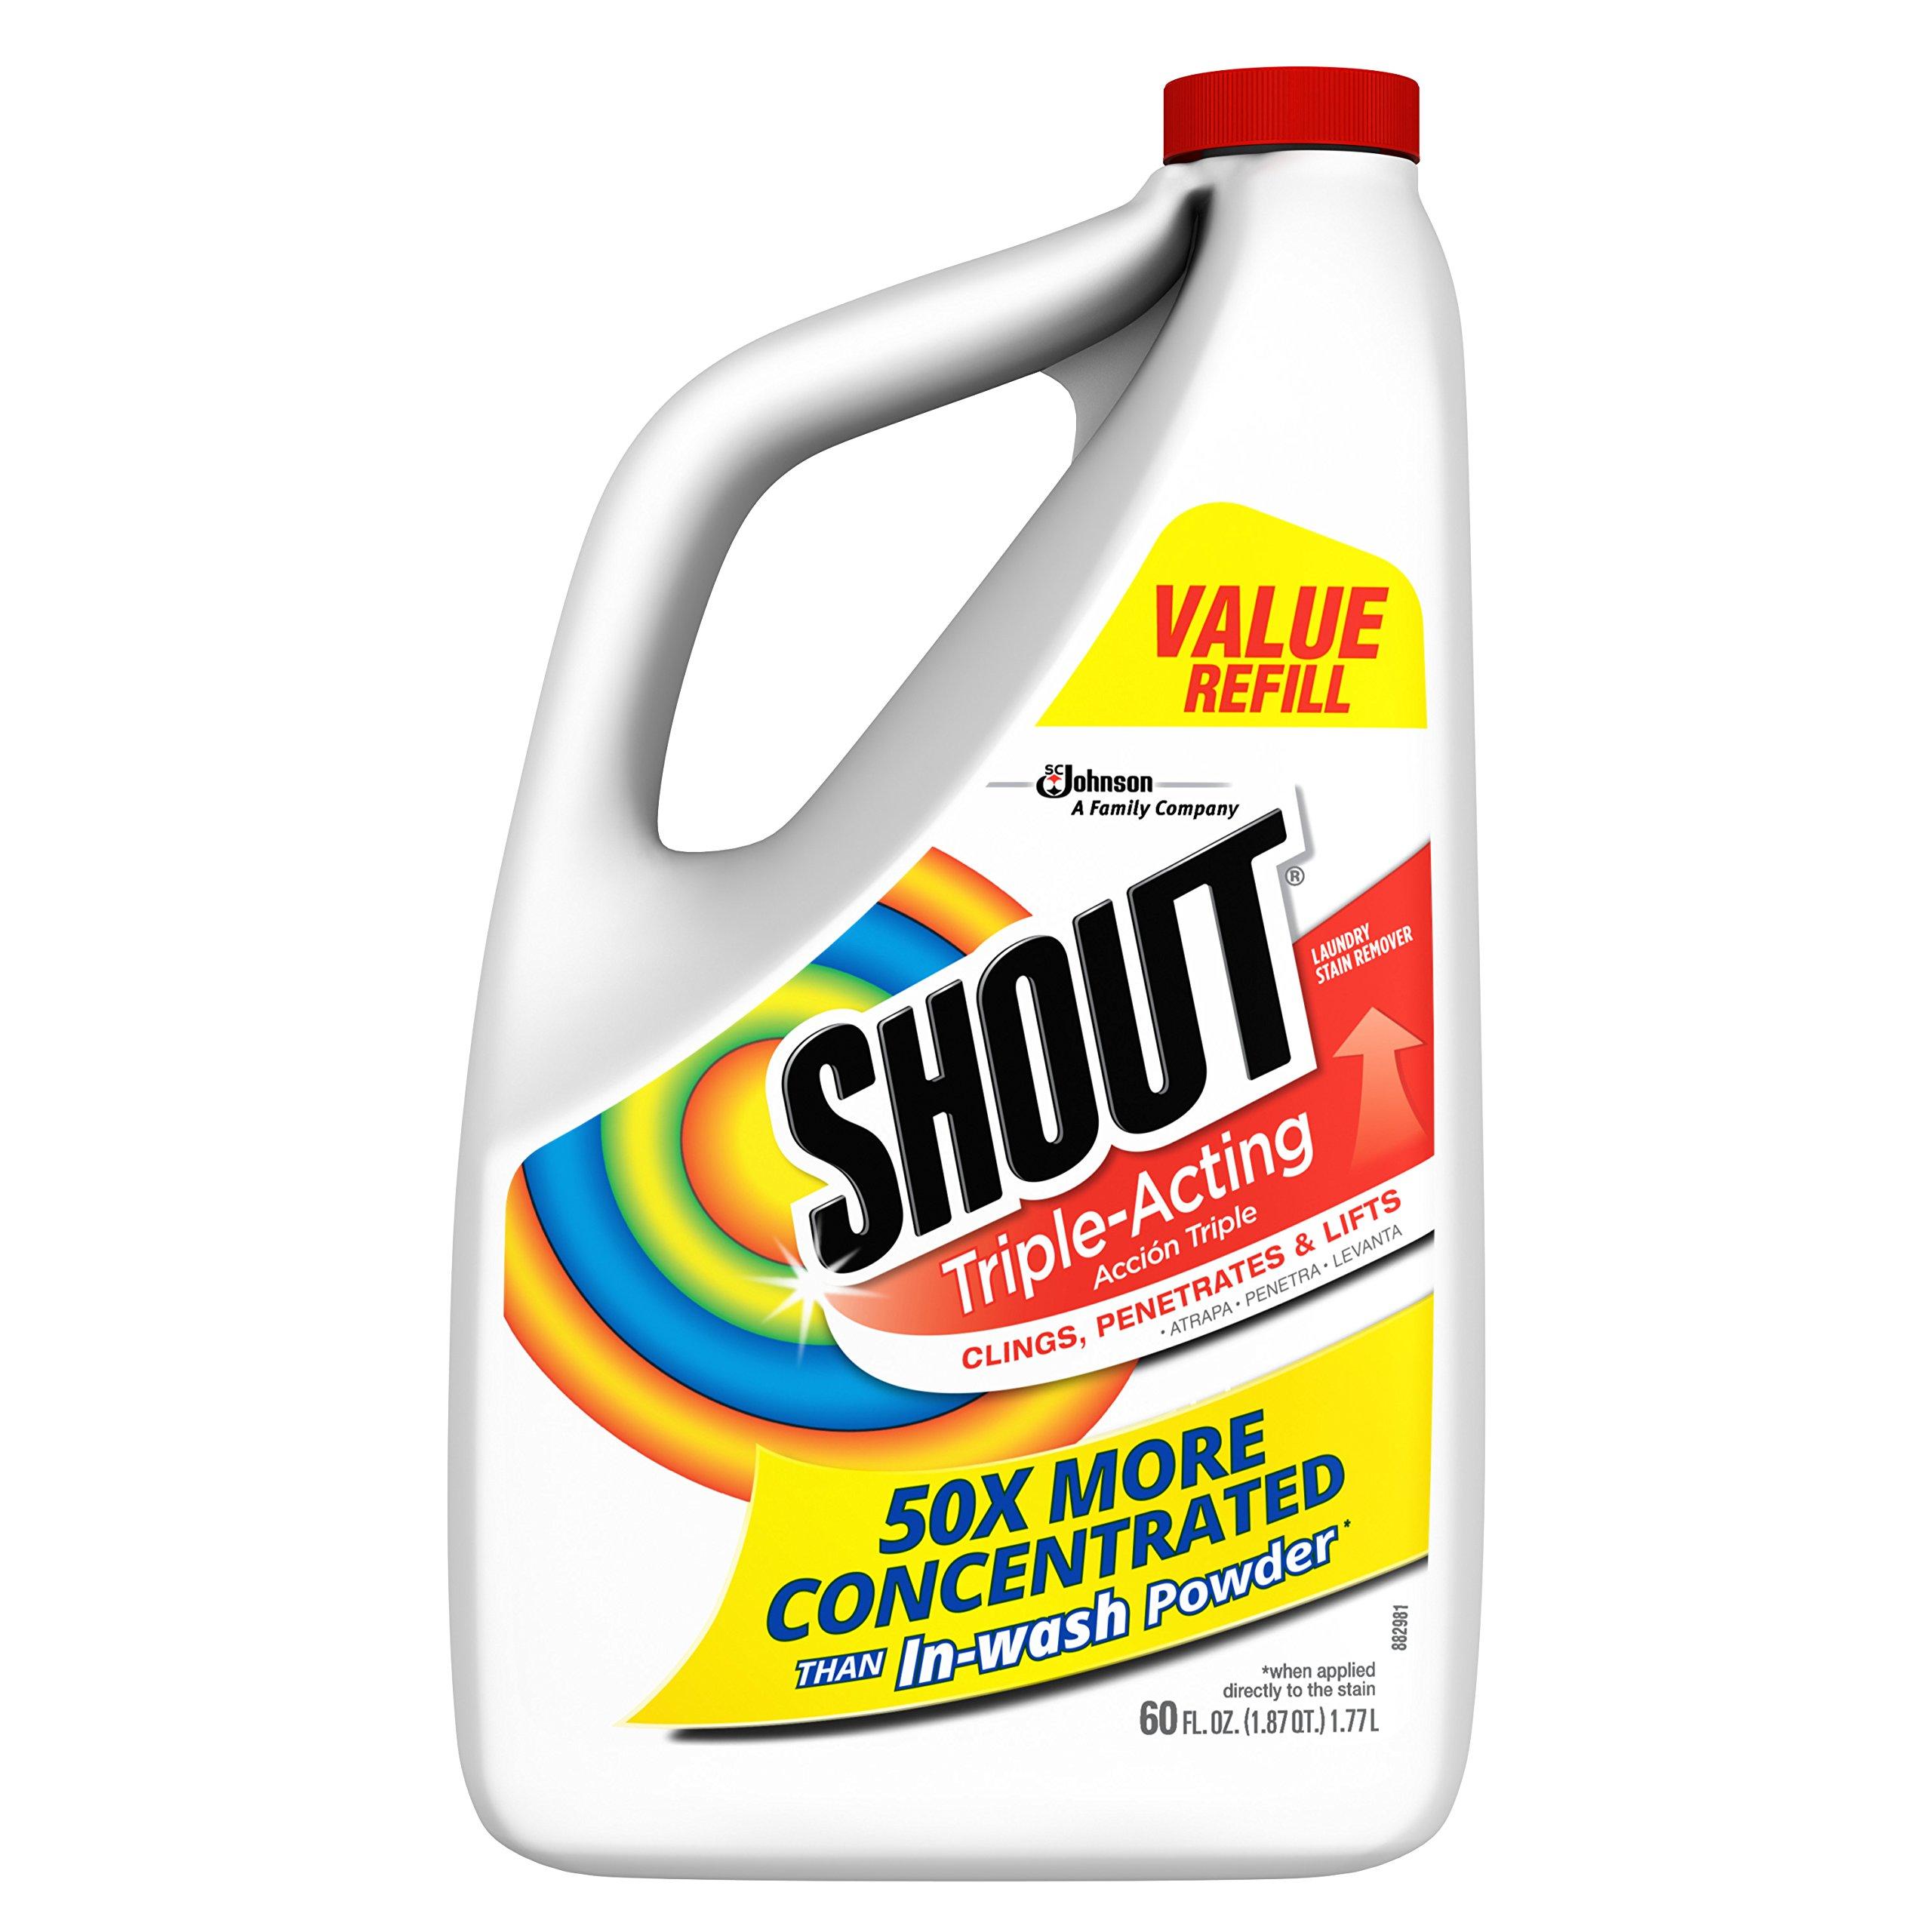 Shout Triple-Acting Liquid Refill 60 fl oz. (Pack of 6)